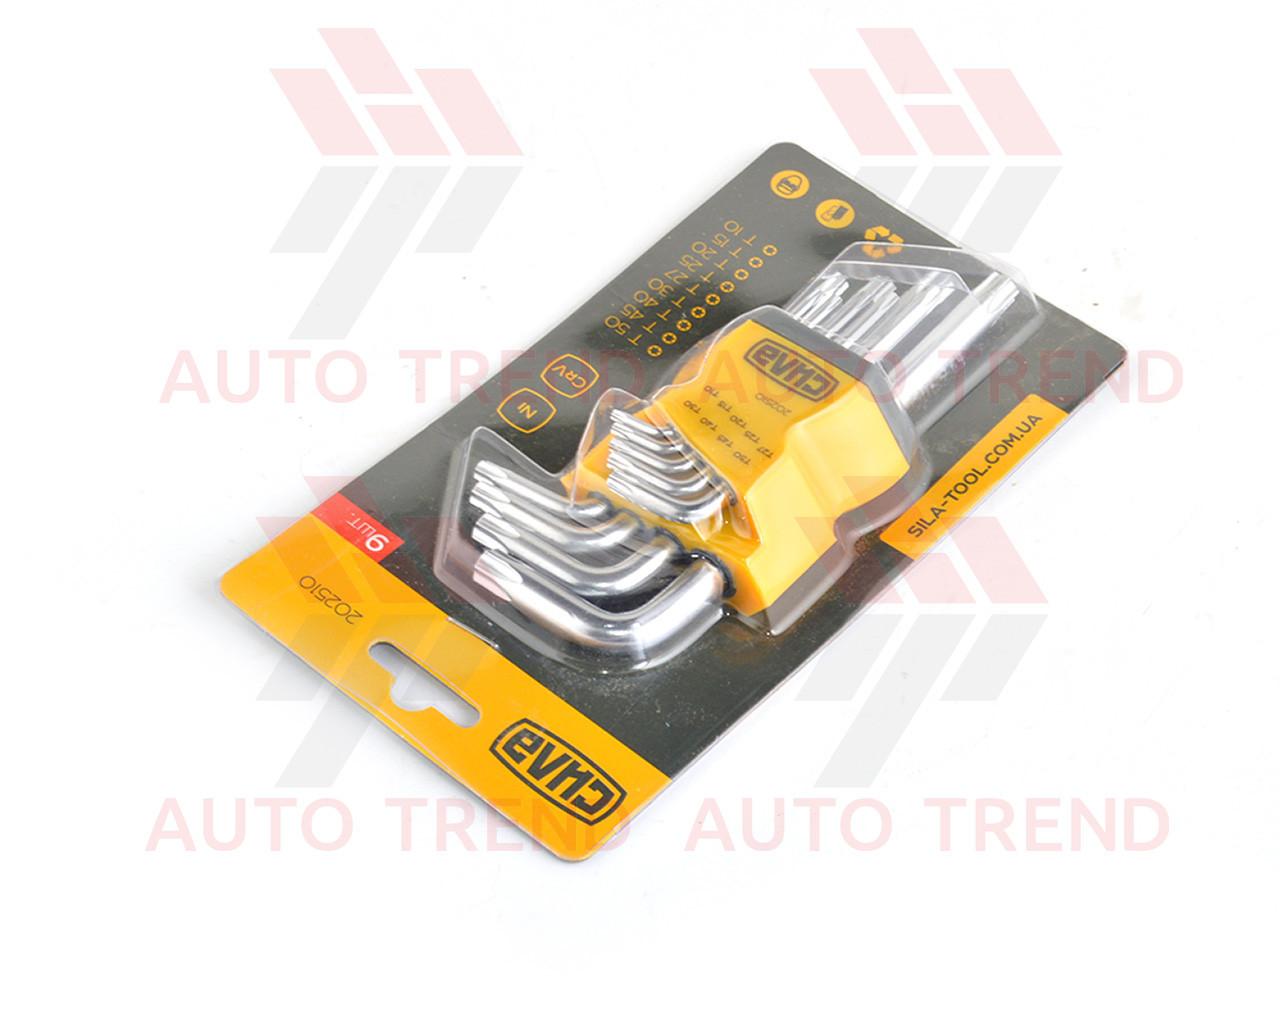 Набор Г-образных ключей Torx (Т10, Т15, Т20, Т25, Т27, Т30, Т40, Т45, Т50) коротких CrV 9 шт.